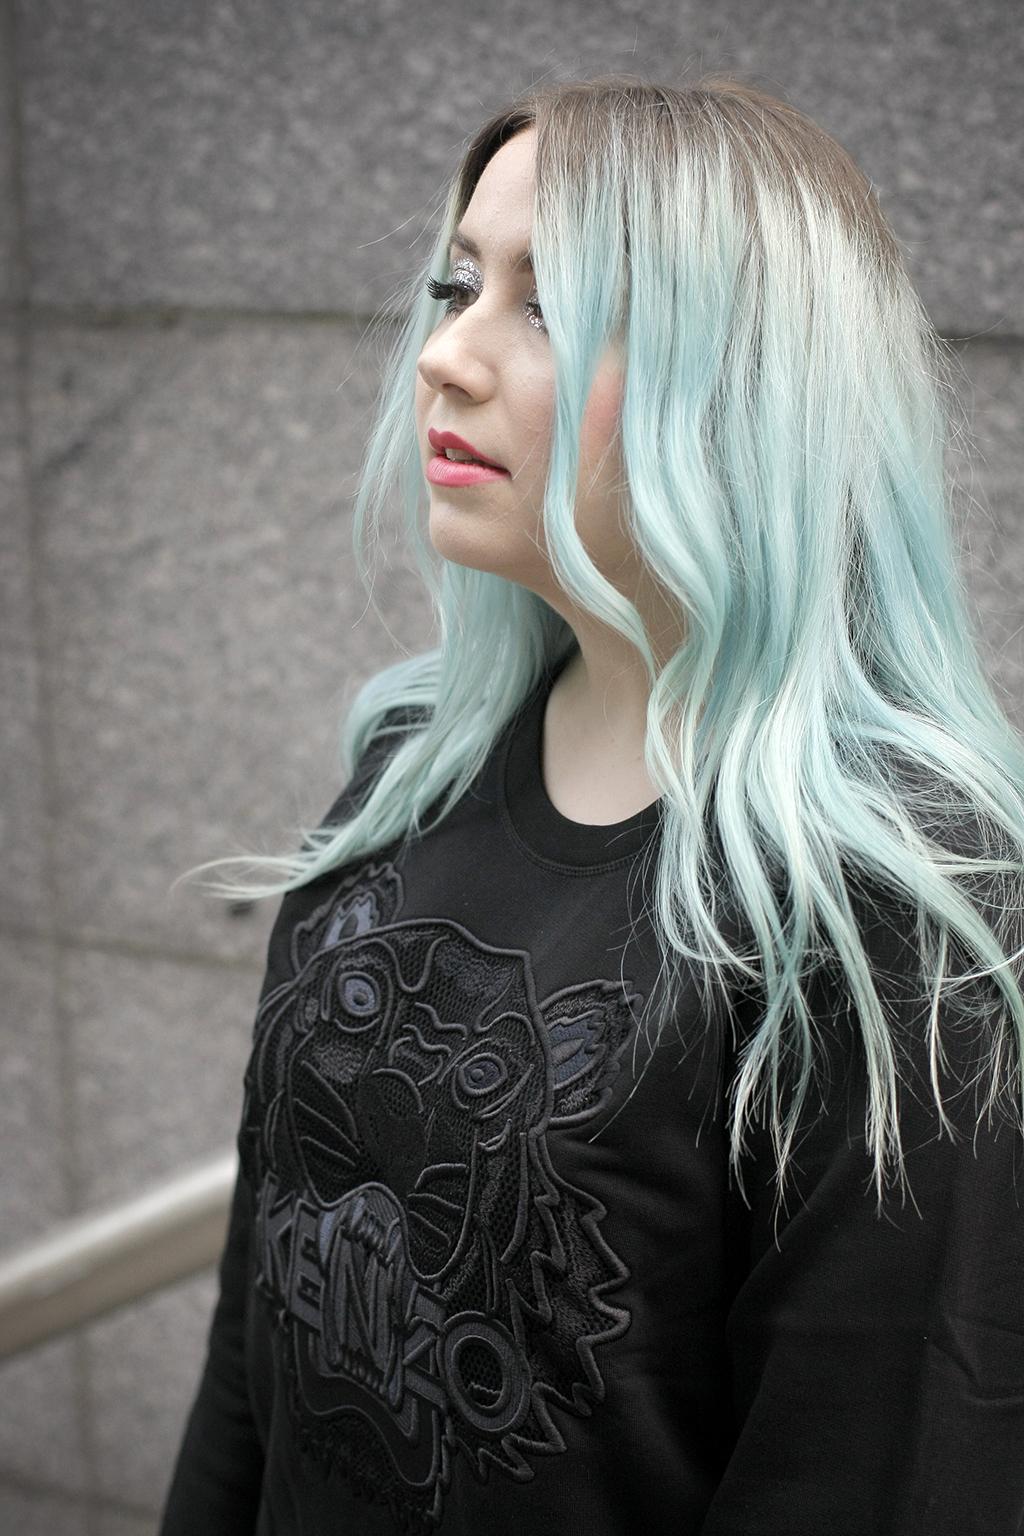 kenzo tiger mesh mermaid hair